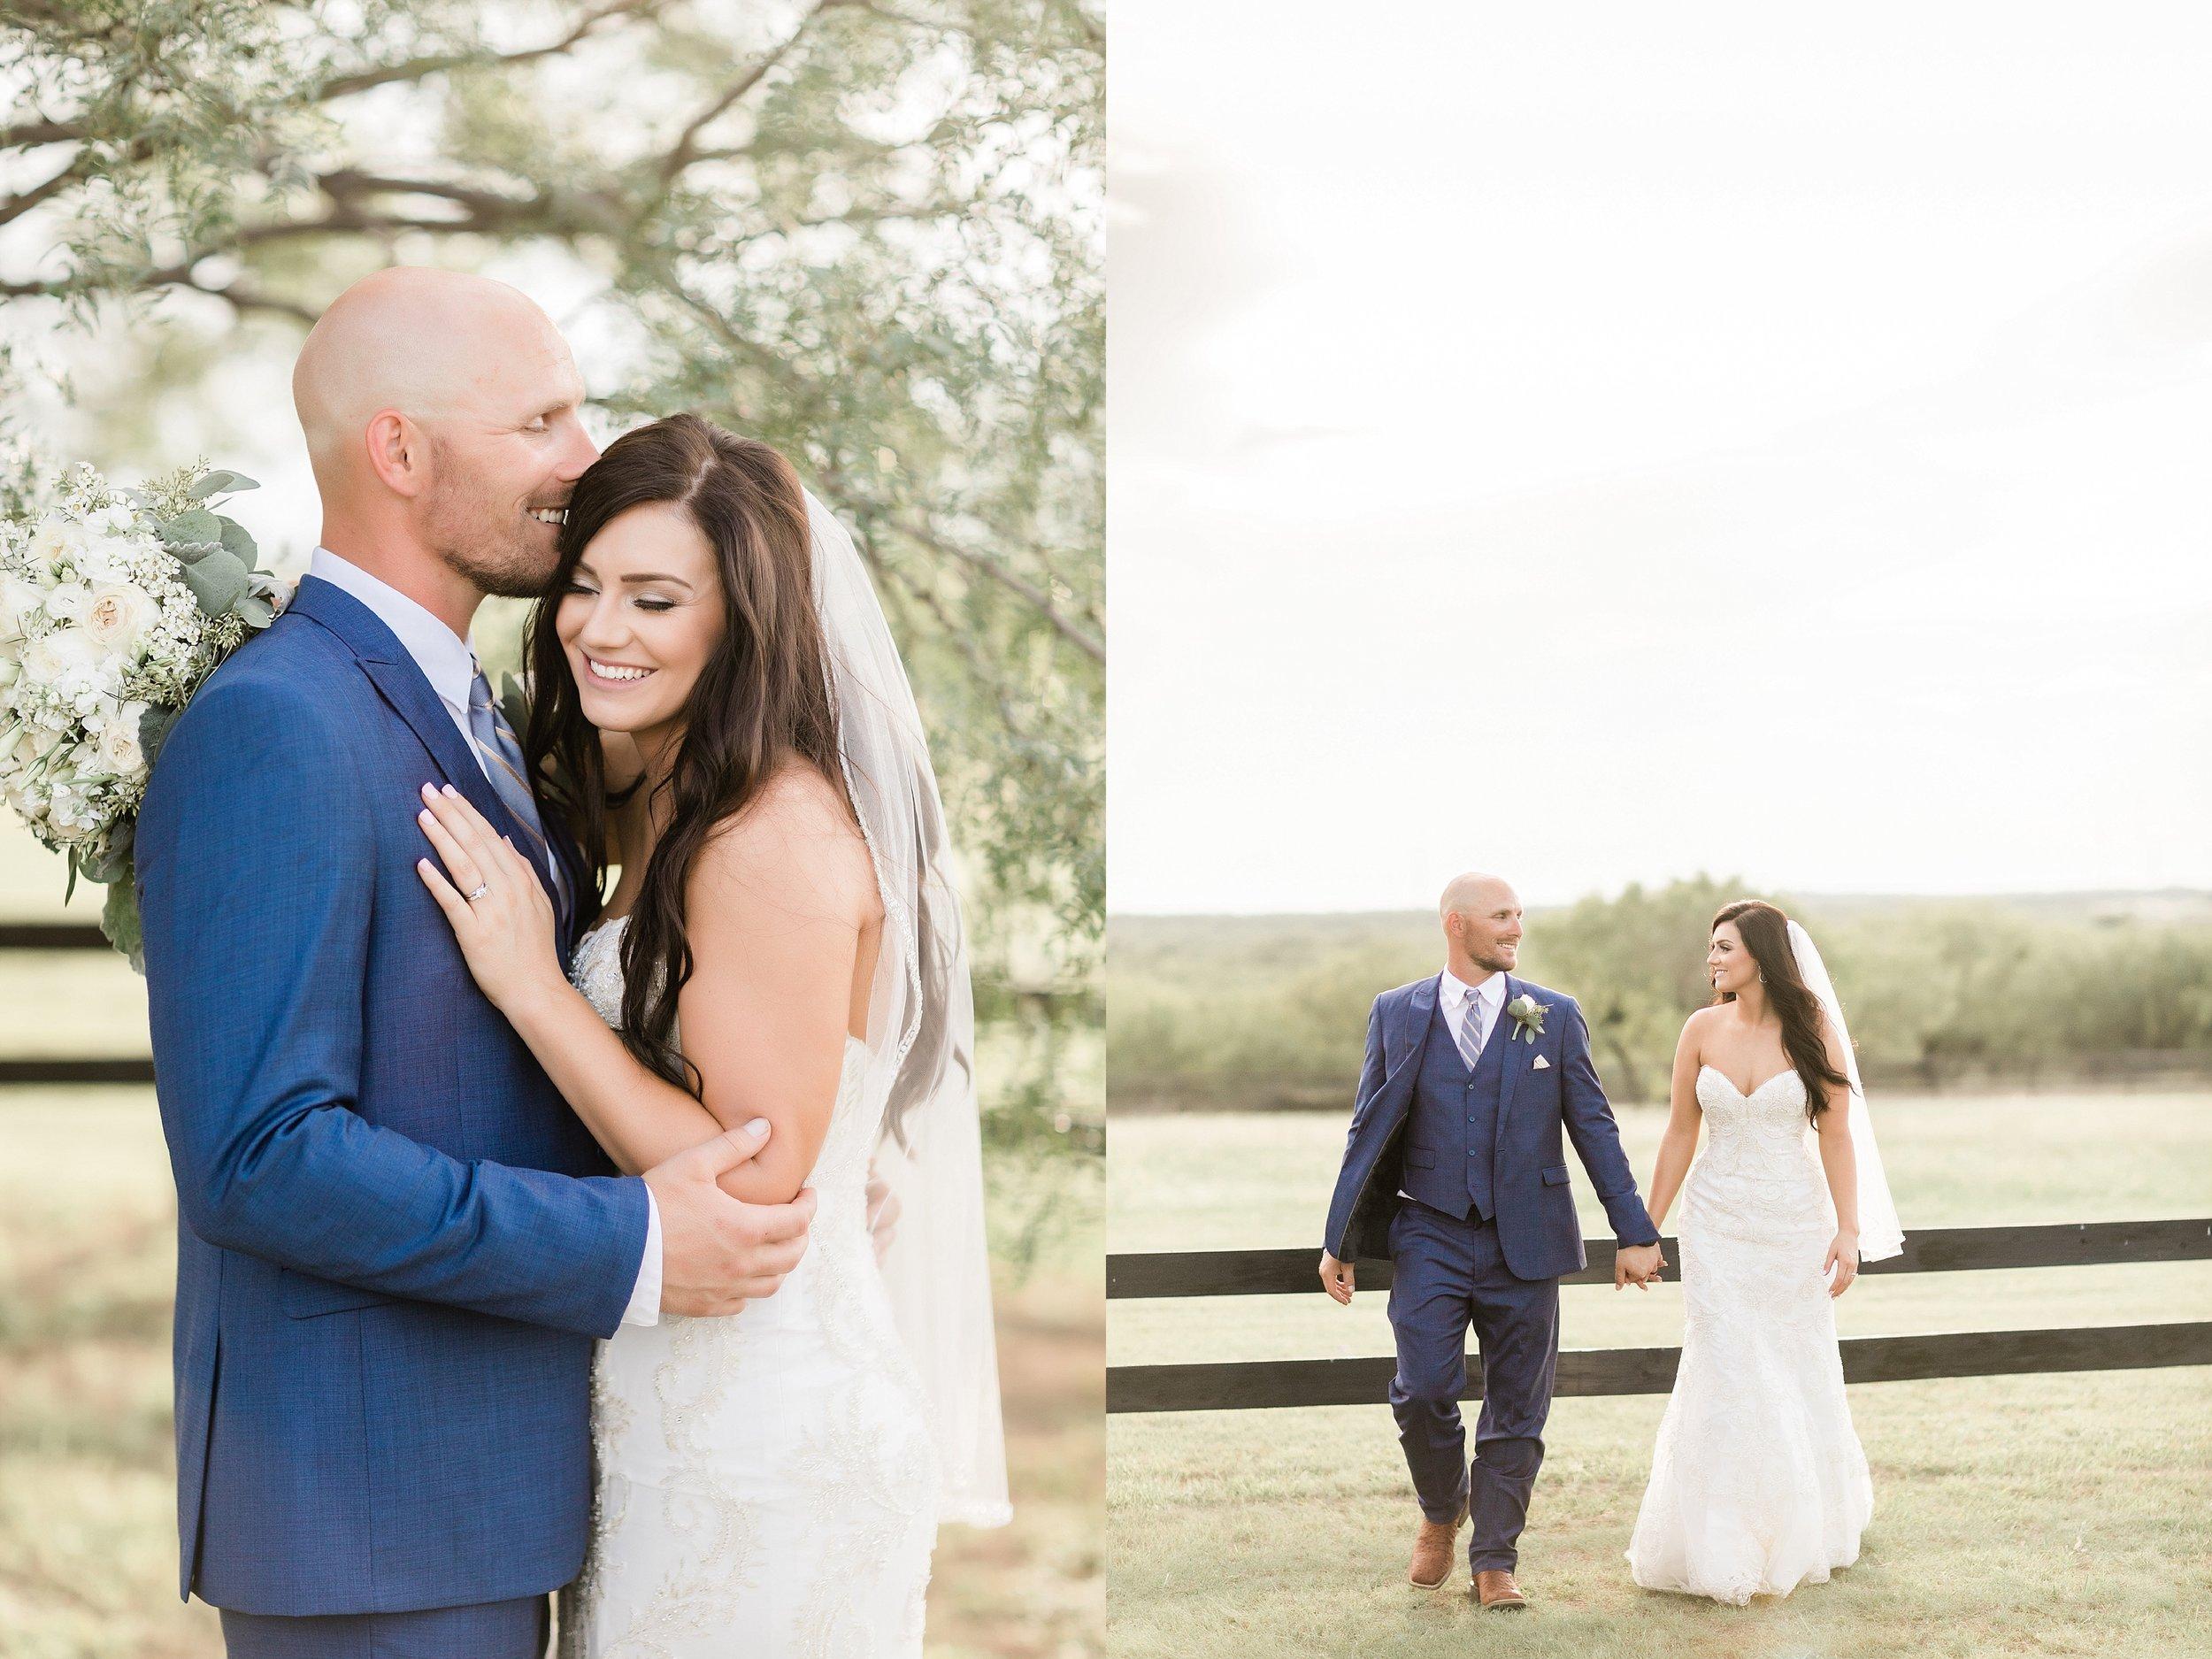 bailey-and-carl-coyote-ranch-resort-wedding-photographer-wichita-falls-texas-destination-wedding-0045.jpg